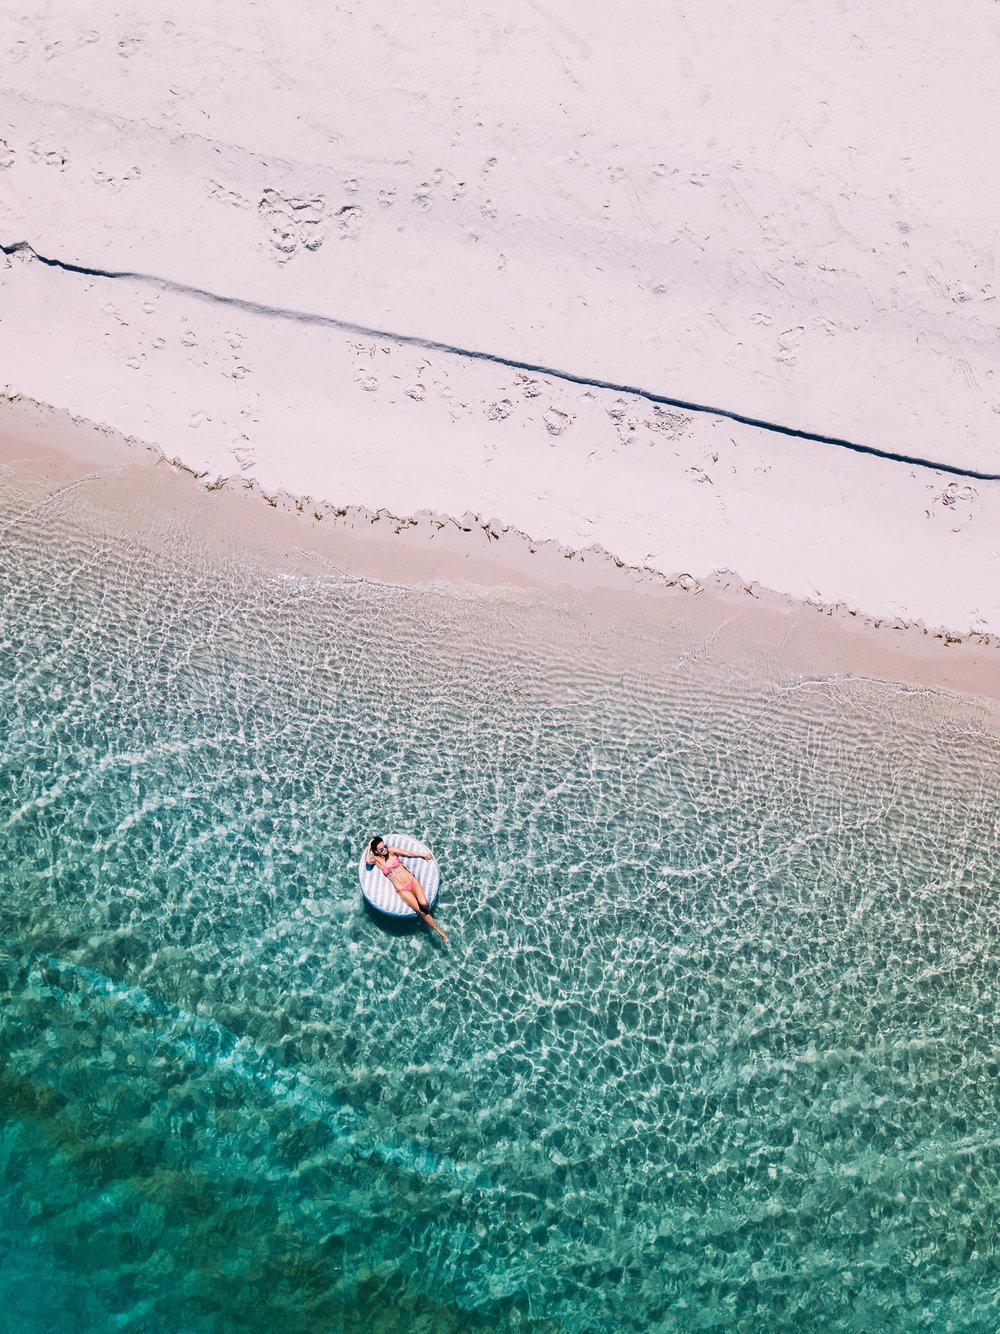 AERIAL 2048px SANTORINI PHOTO - ACTIVITIES - SEA DONUT - AERIAL 093-Edit.jpg